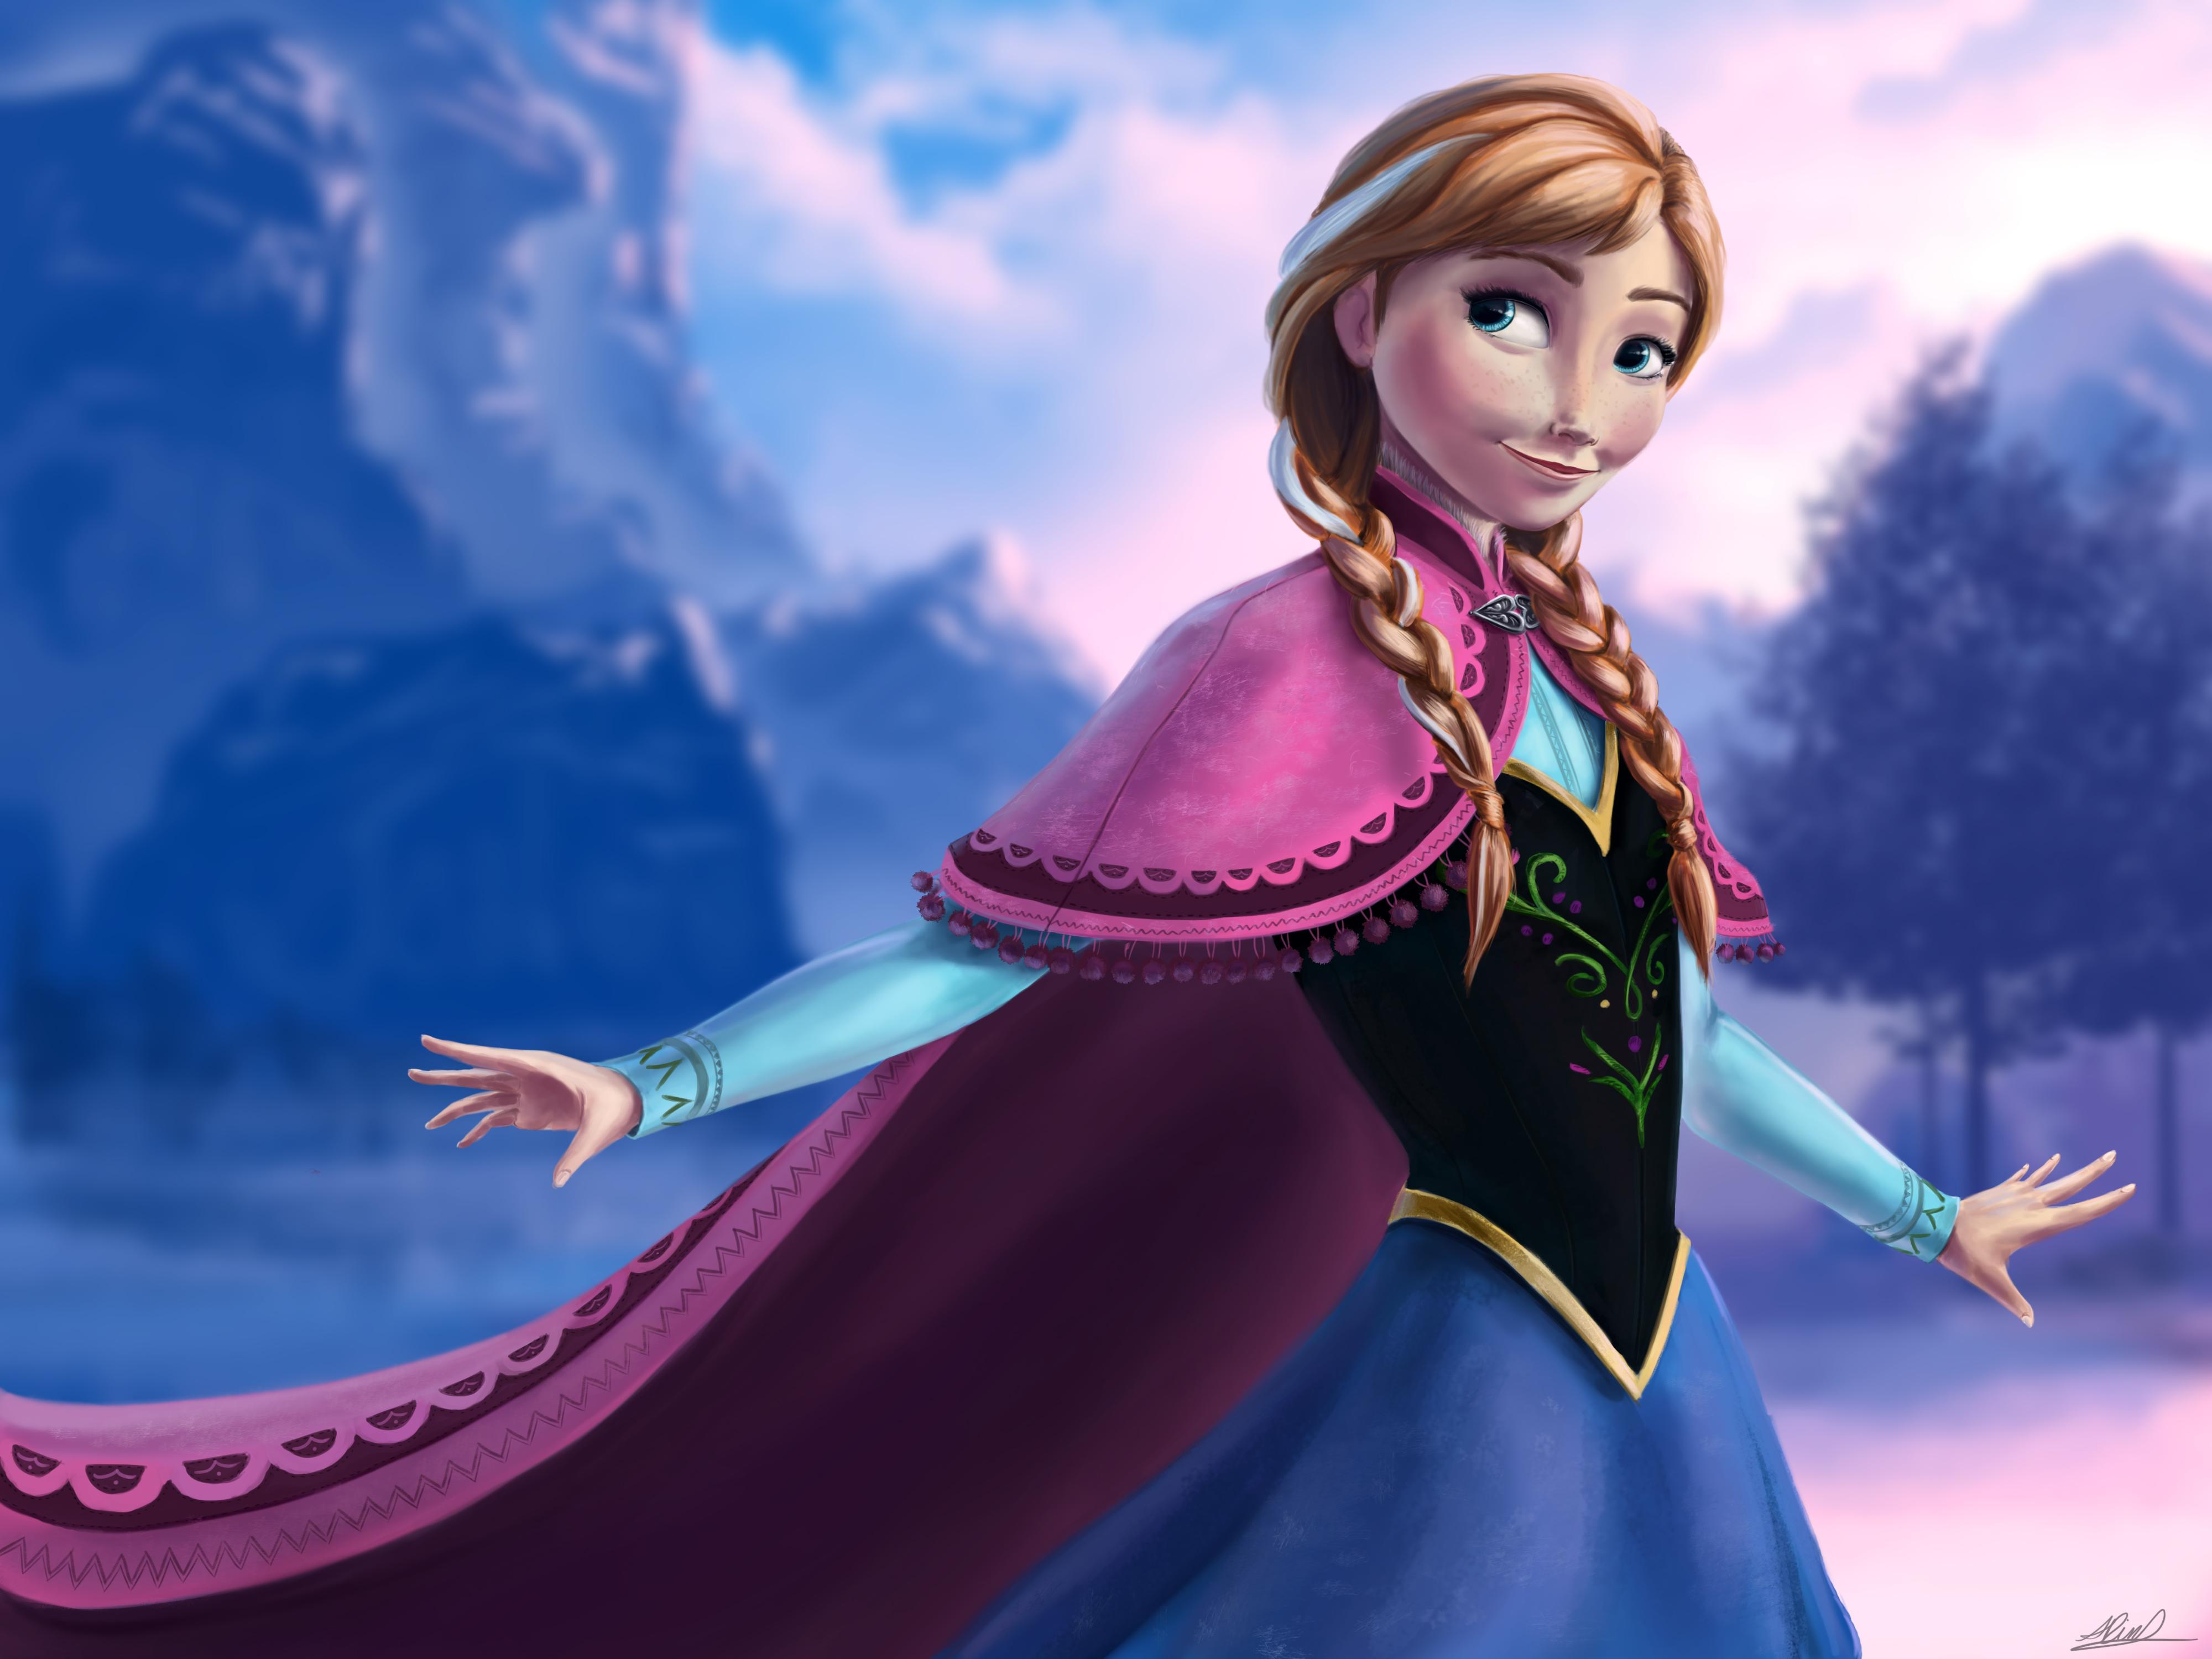 anna frozen wallpaper,cg artwork,sky,fictional character,illustration,animation